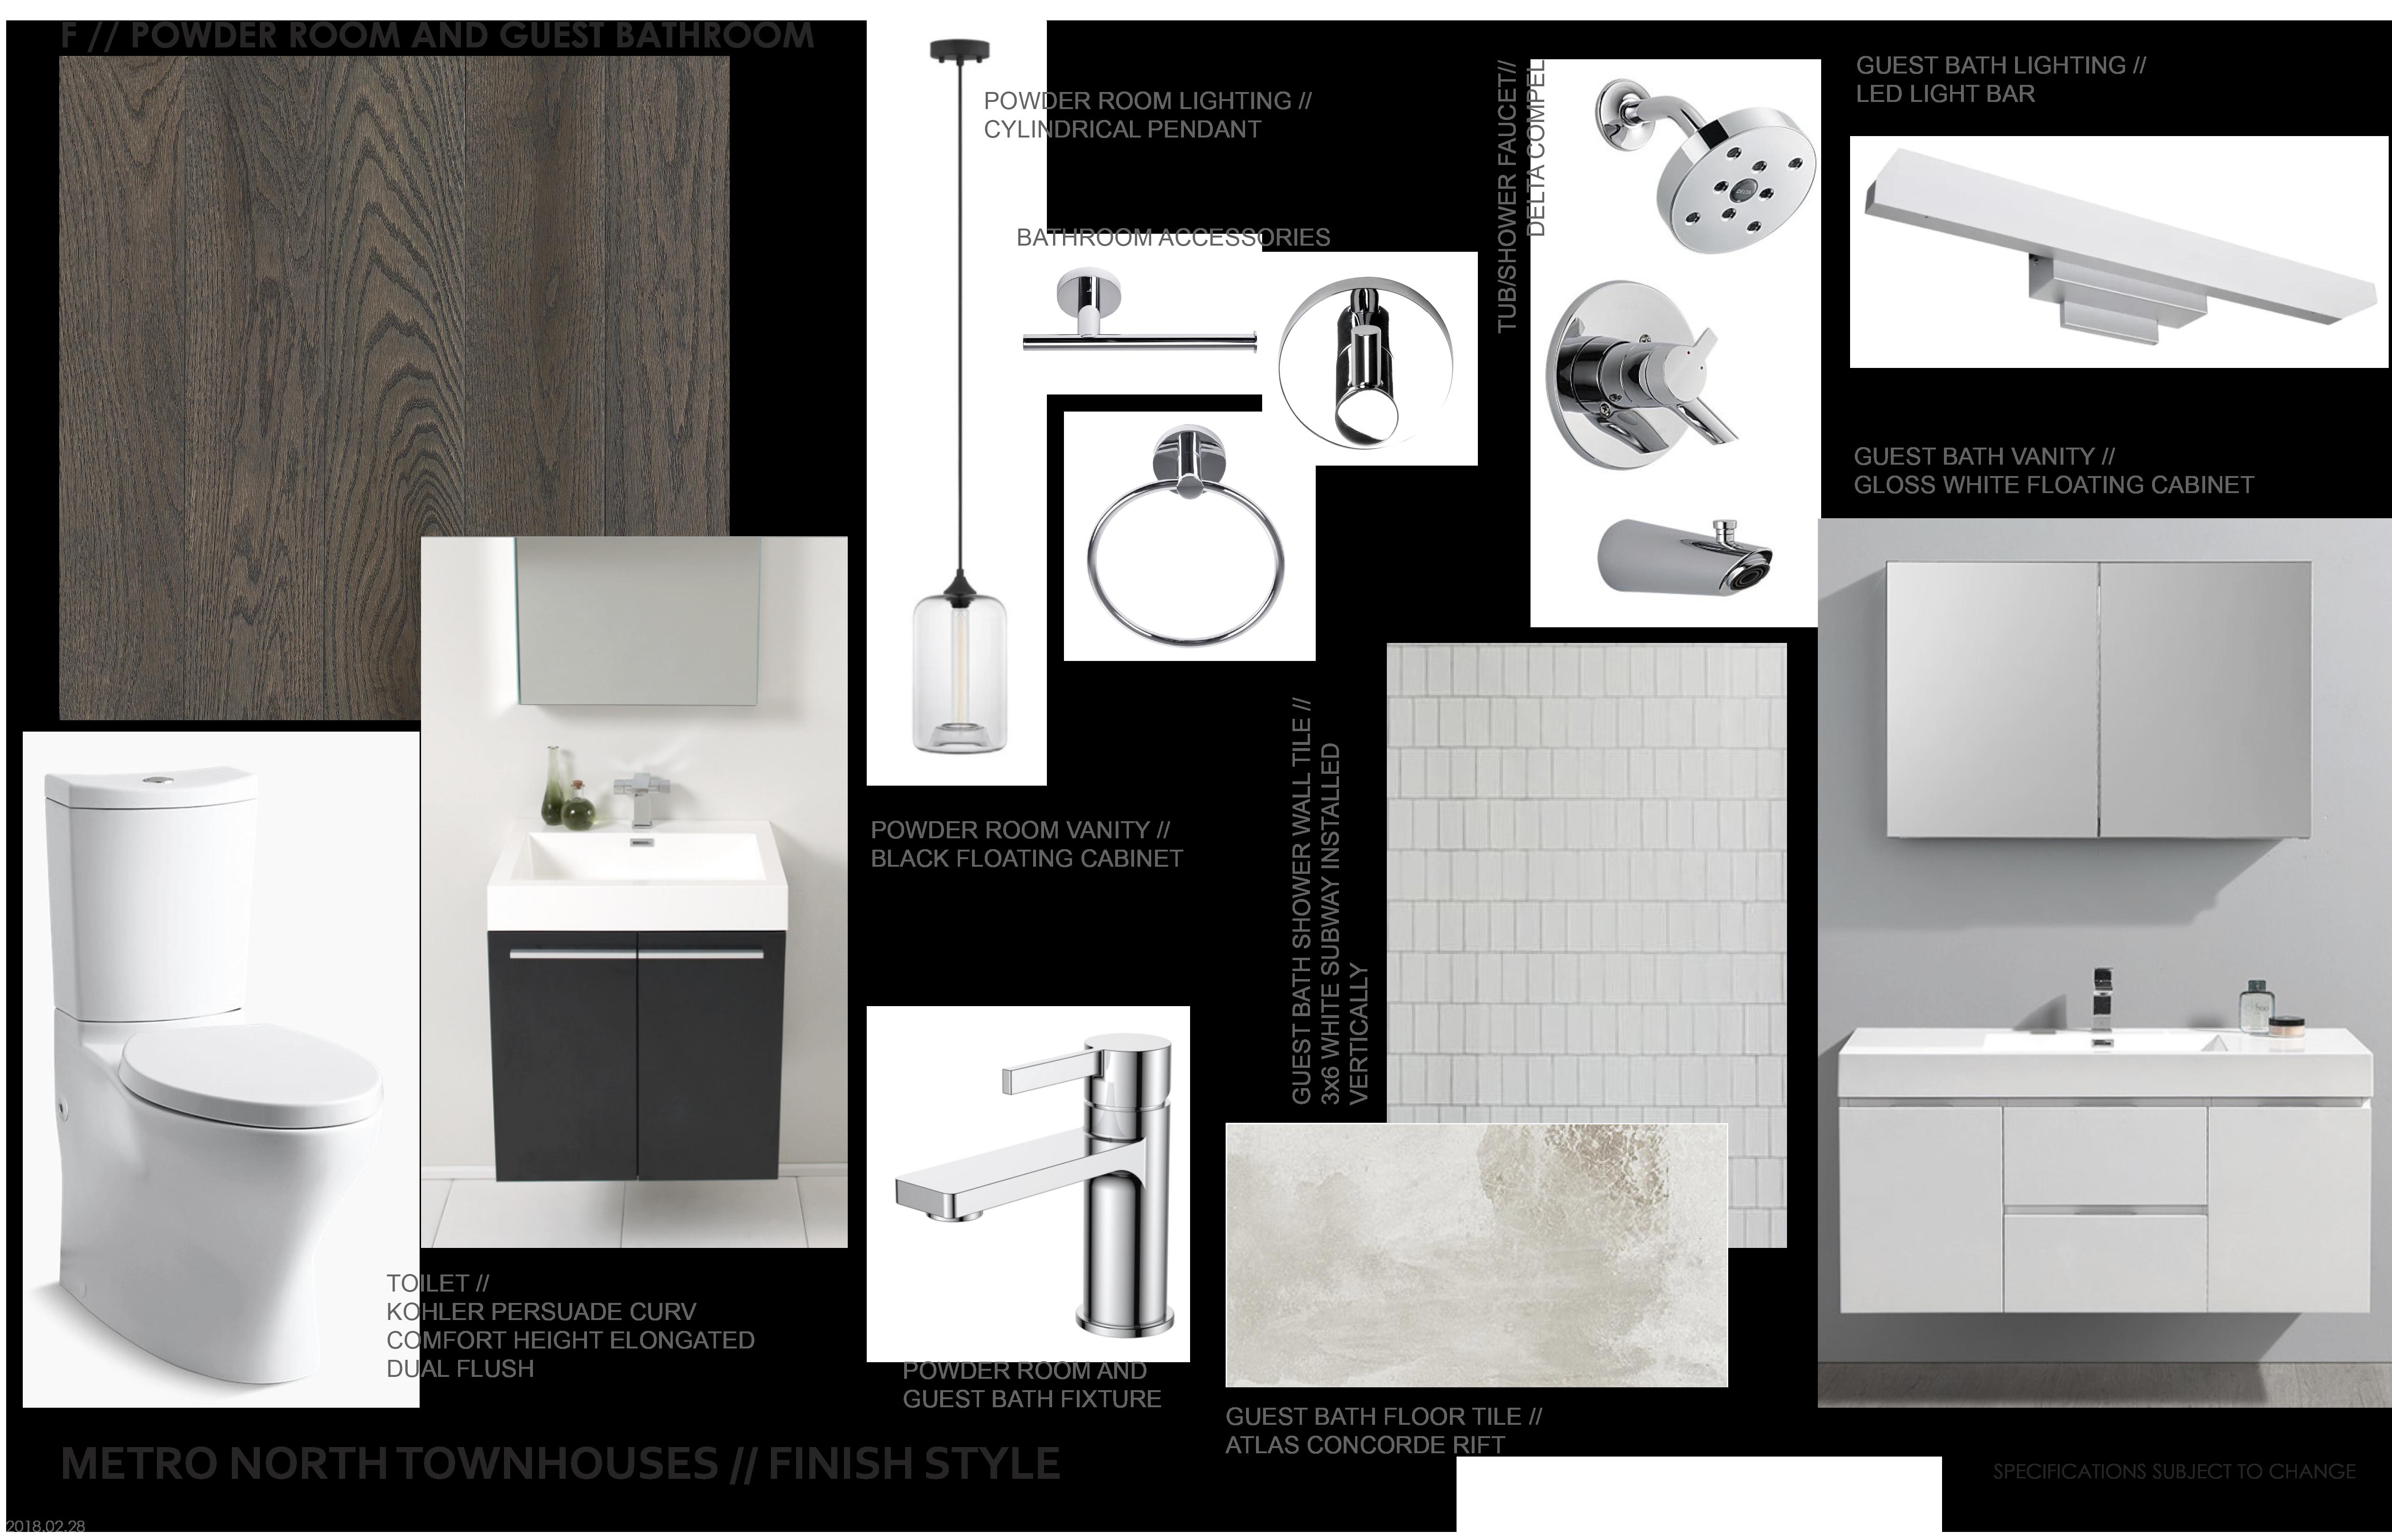 Floor clipart bathroom tile. Powder room guest fixture